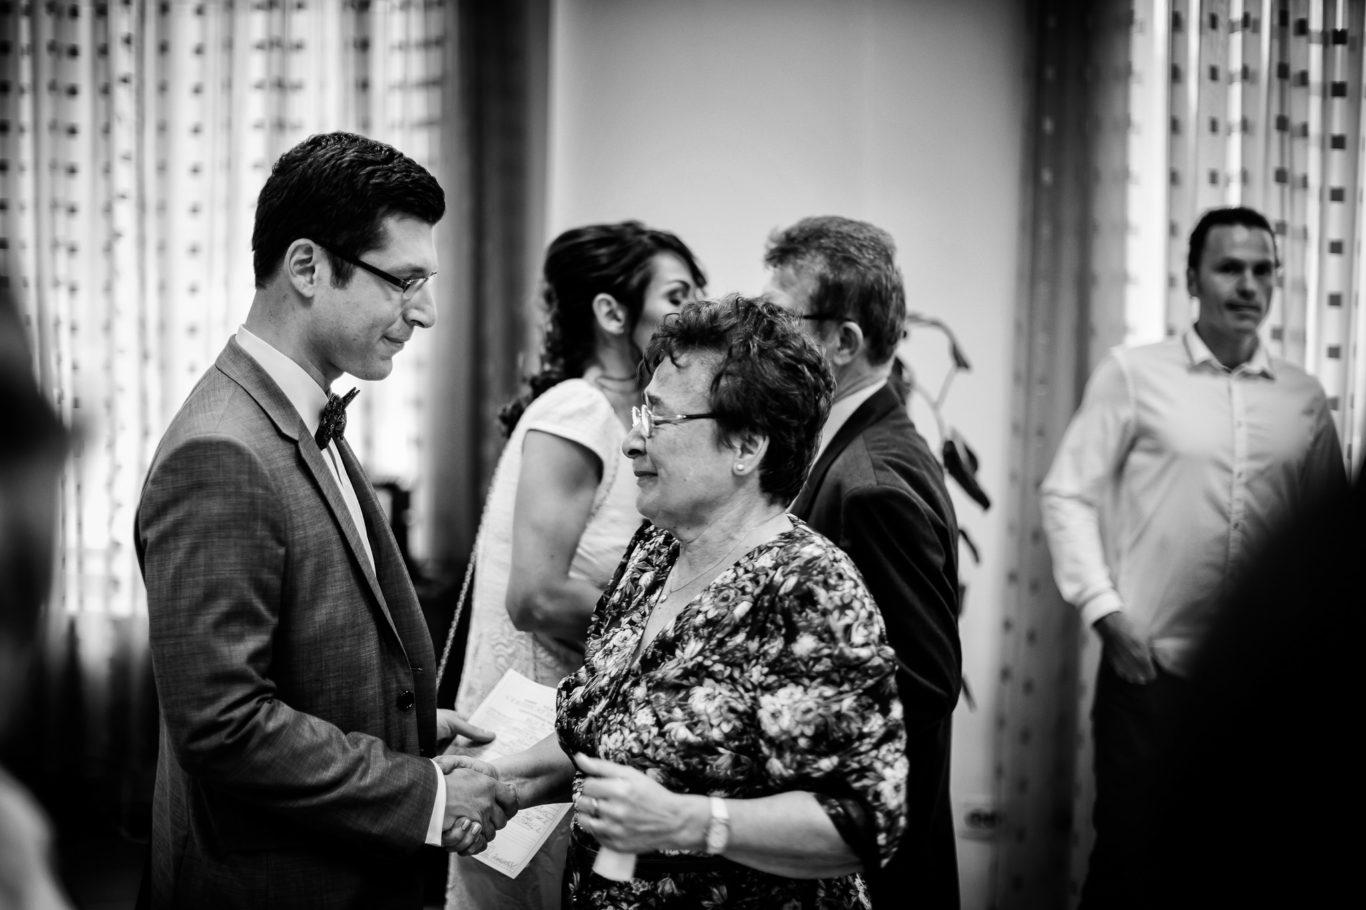 0064-fotografie-nunta-bucuresti-dana-radu-fotograf-ciprian-dumitrescu-cd2_6262